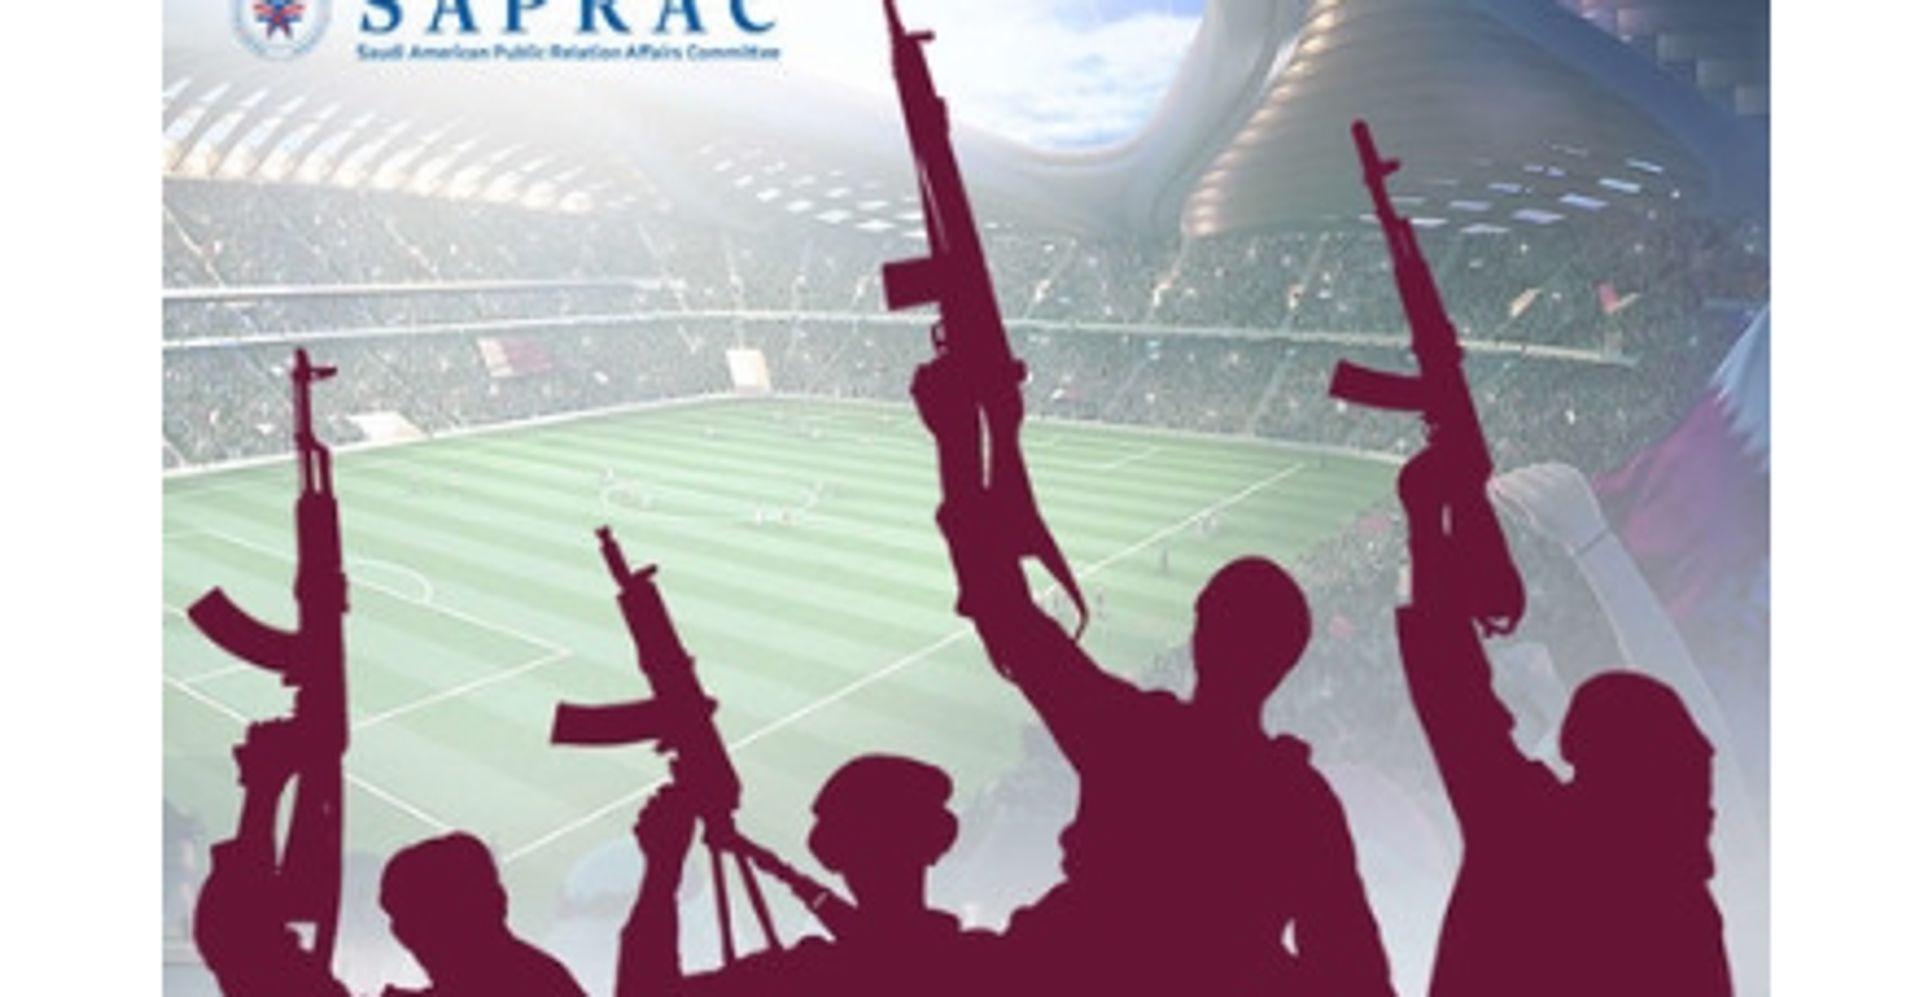 US Should Host 2022 World Cup, Not Qatar